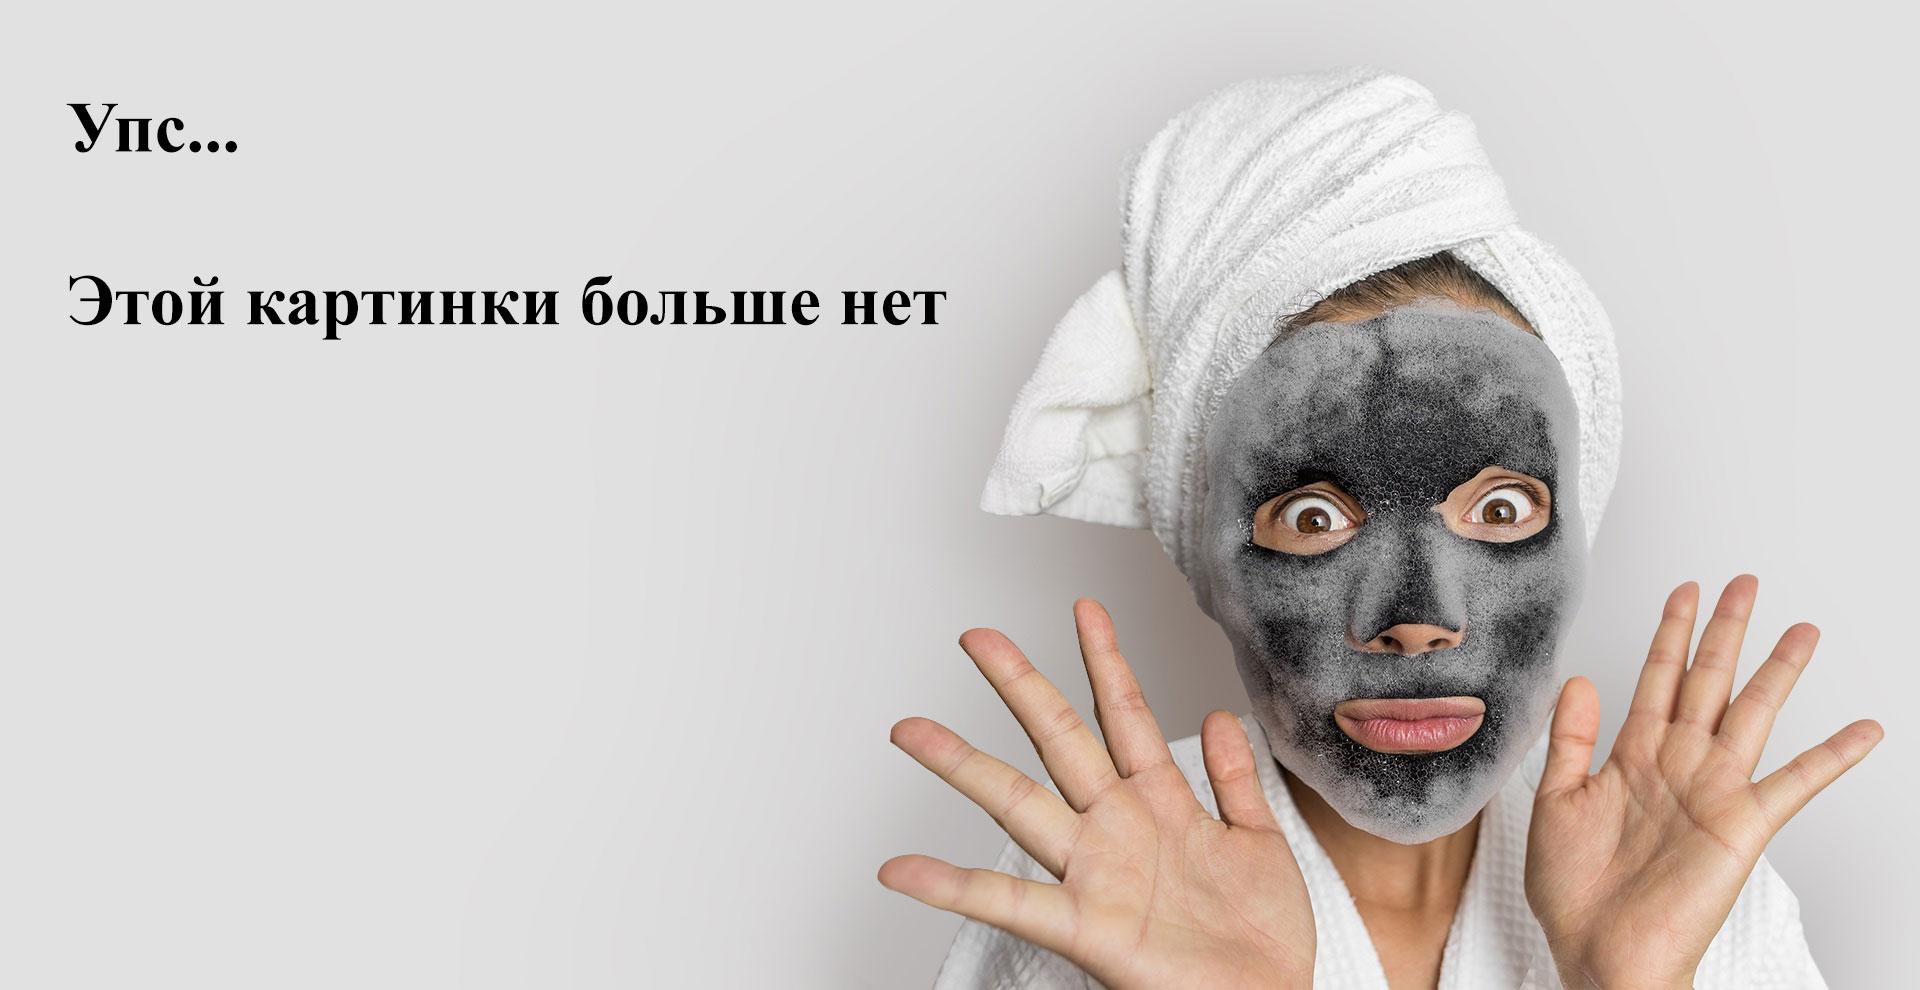 Vivienne Sabo, Туалетная вода Parfum Atelier, Vivienne, 50 мл